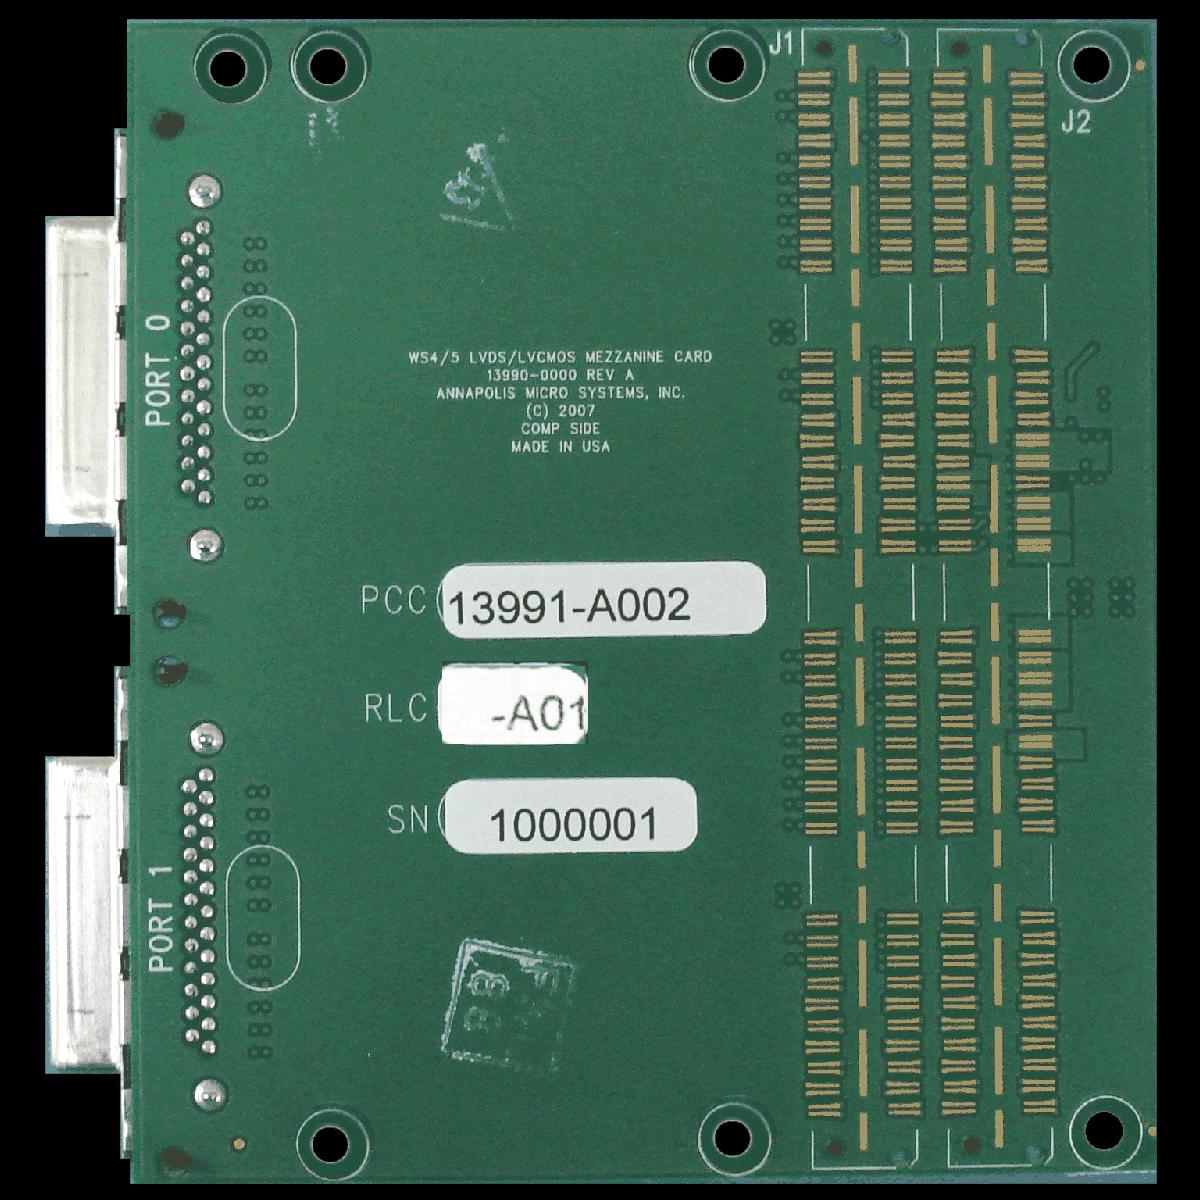 High Performance Rugged LVDS 2 5V-LVCMOS Mezzanine Card